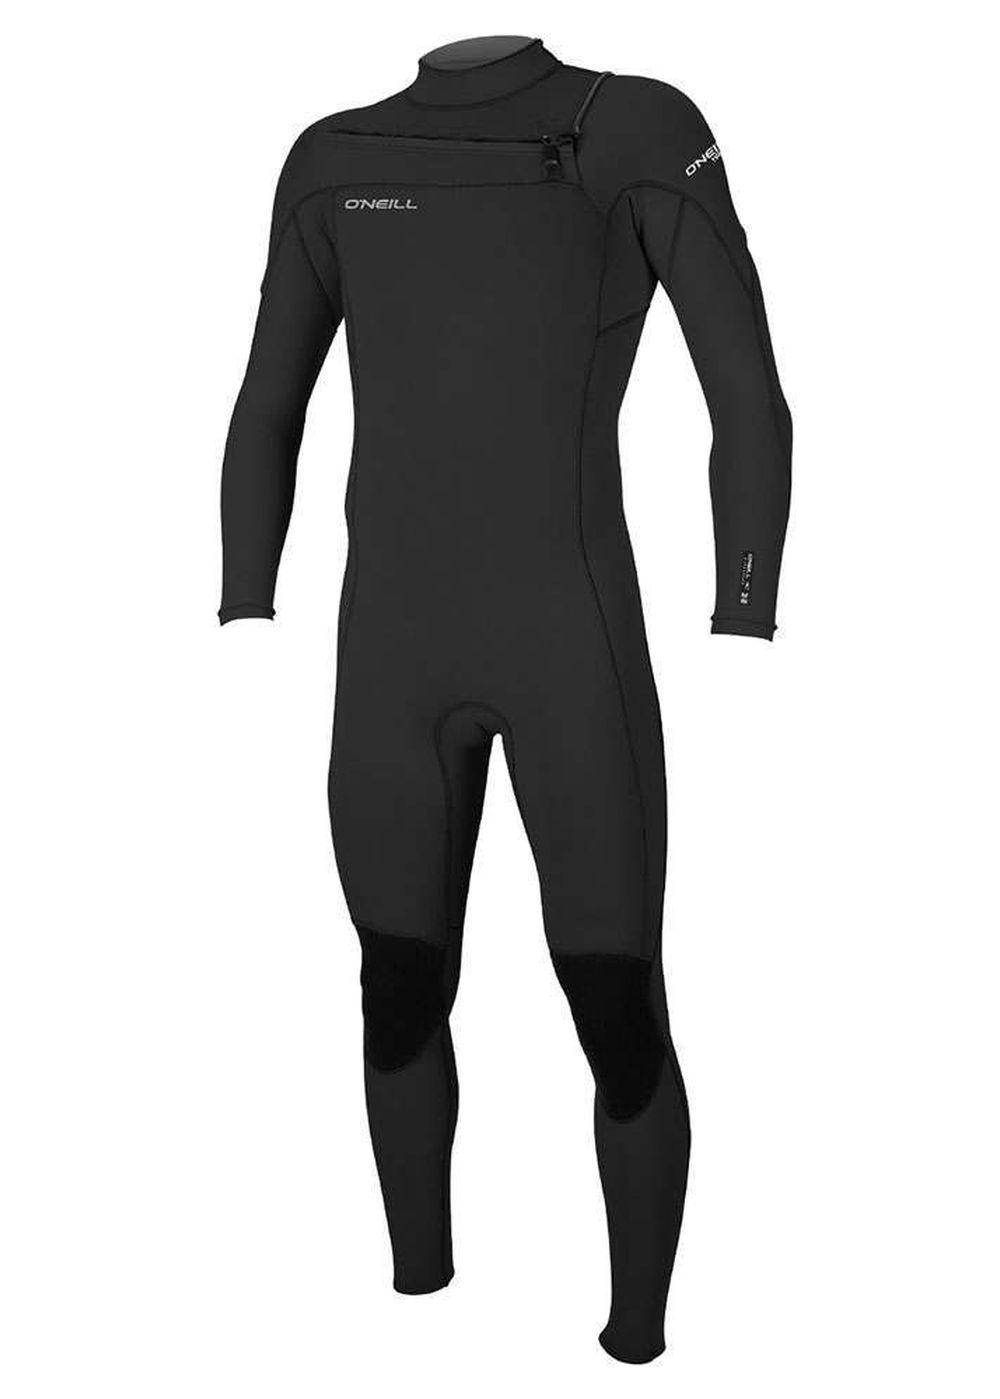 Oneill Hammer Fz 3/2 Wetsuit Black Picture